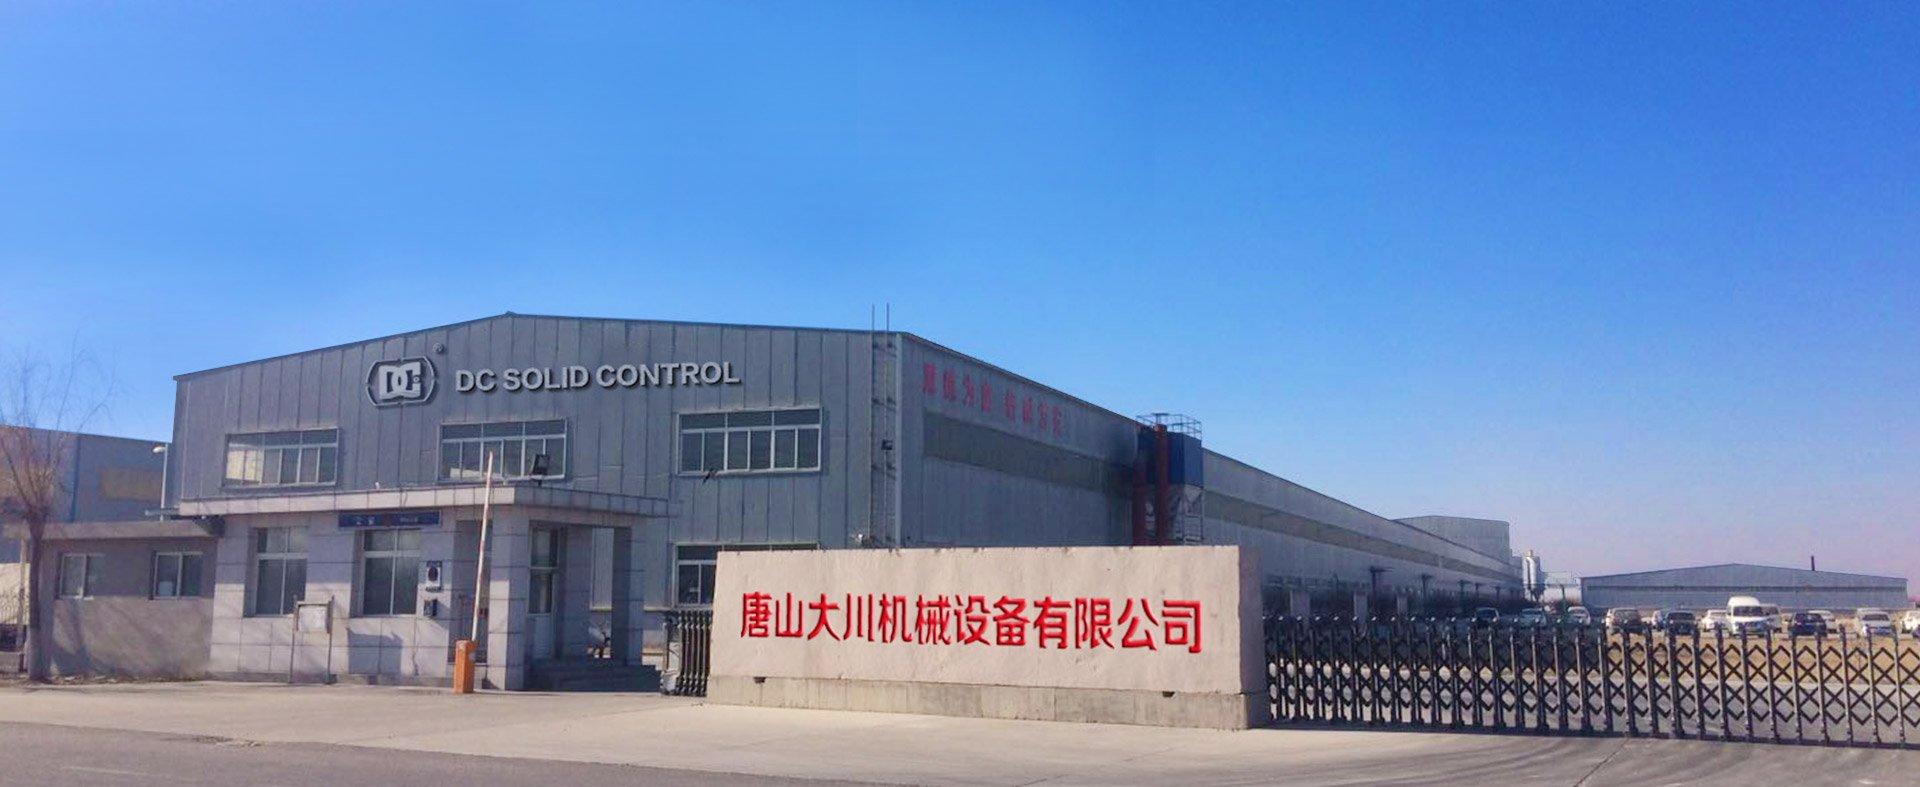 TangShan Dachuan Mechanical Equipment Co., Ltd.